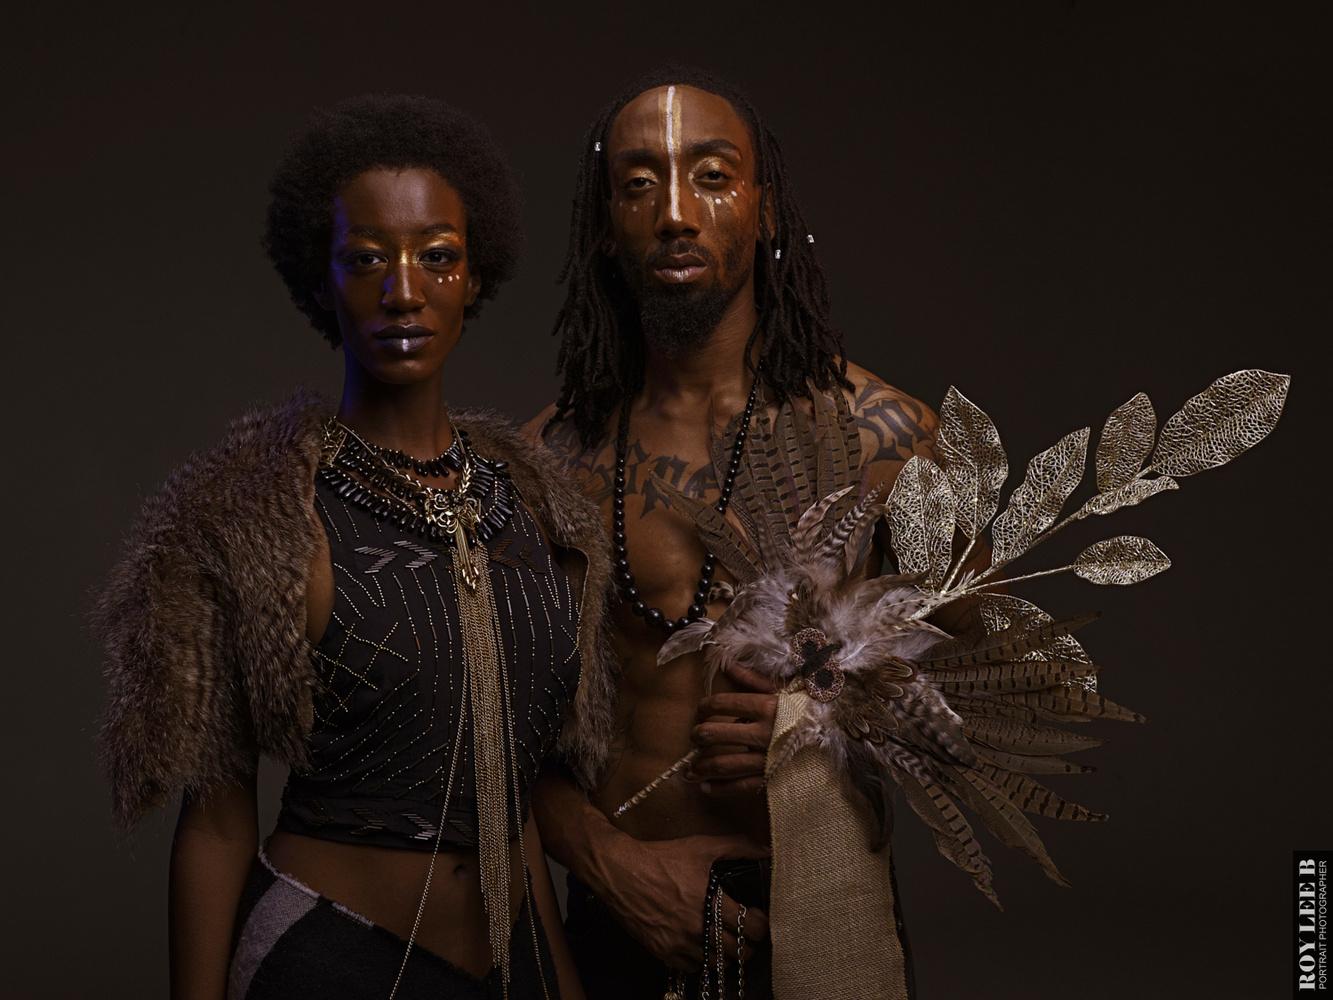 Afrofuturism by Roy Barnett